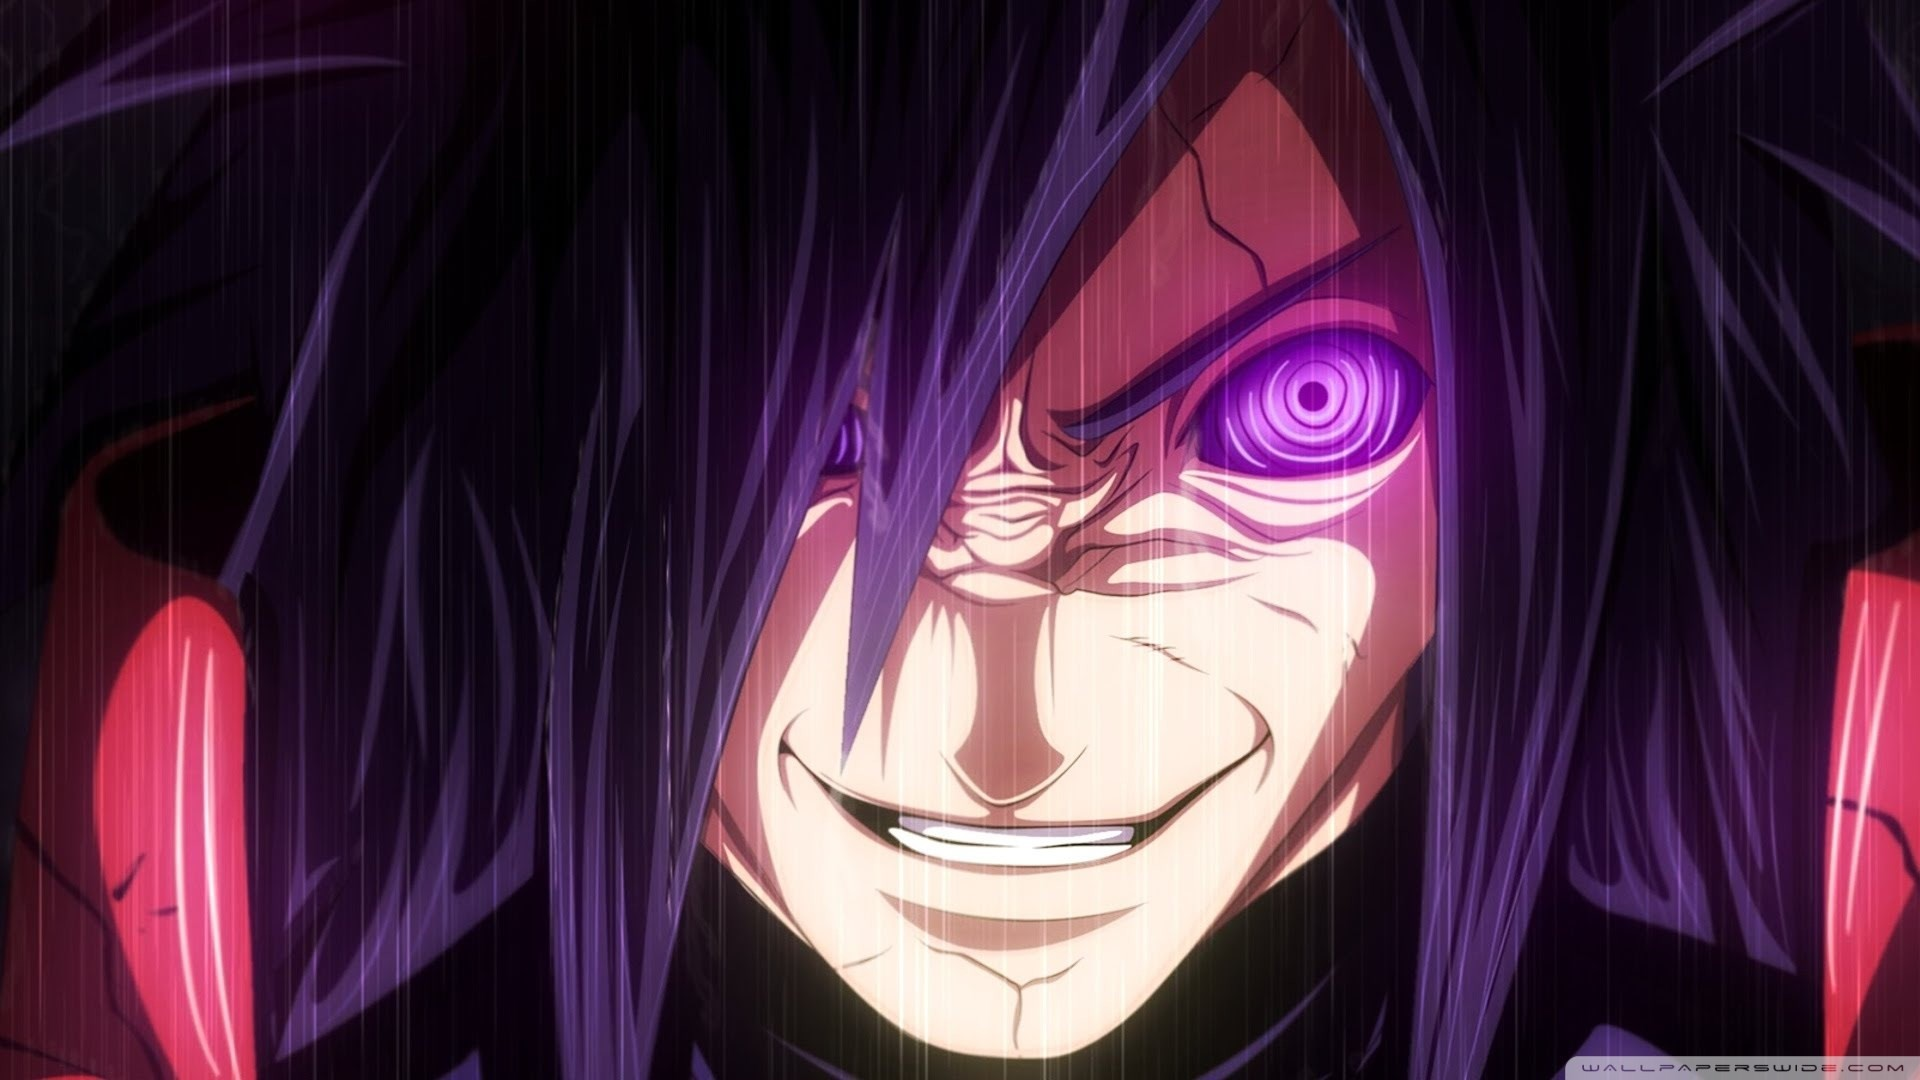 Must see Wallpaper Naruto 1080p - 815049-top-naruto-1080p-wallpaper-1920x1080-download  Trends_525594.jpg